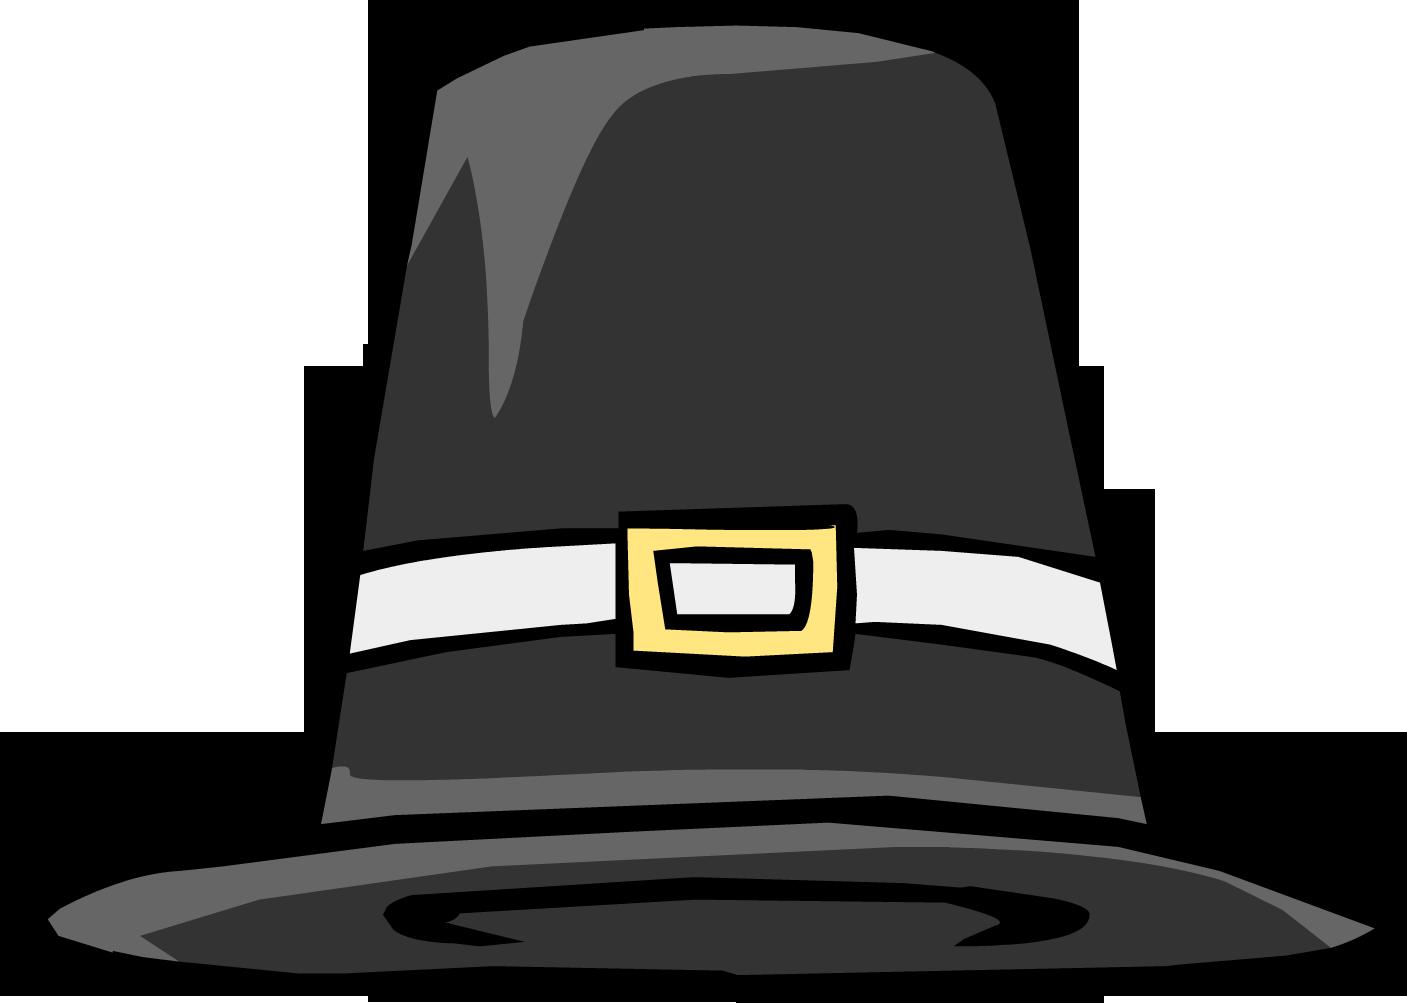 Pilgrim Hat - Club Penguin Wiki - The free, editable encyclopedia ...